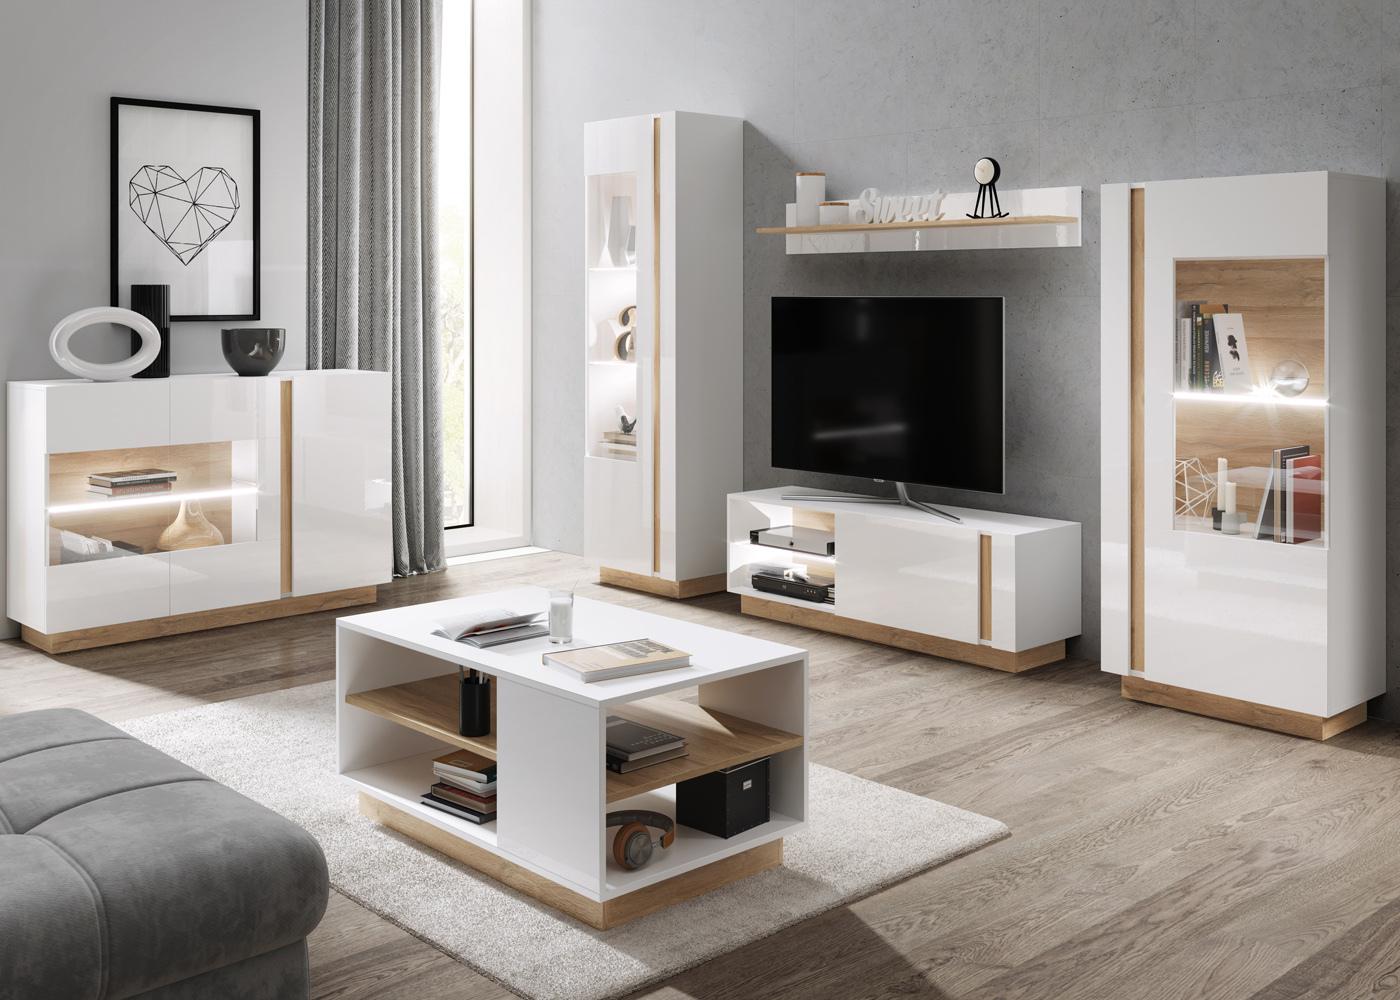 Skoky 4 Piece Living Room Furniture Set White Oak Selsey